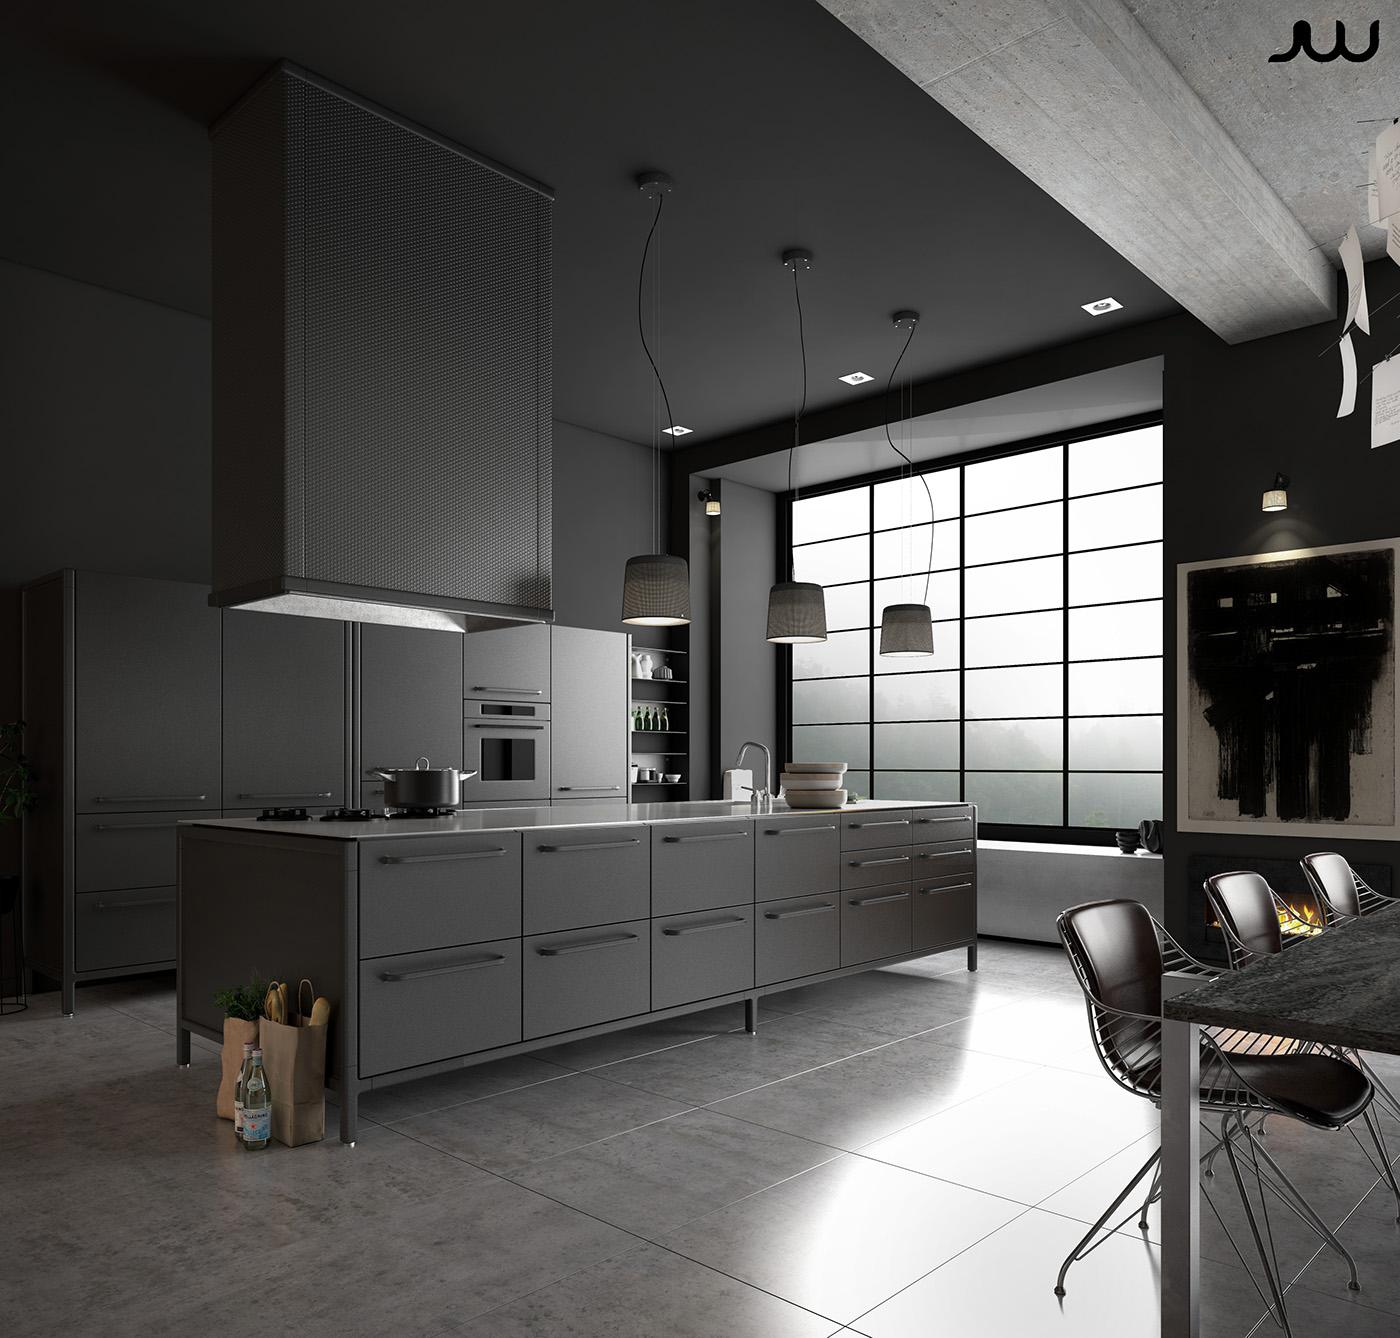 Kitchen Design App Android